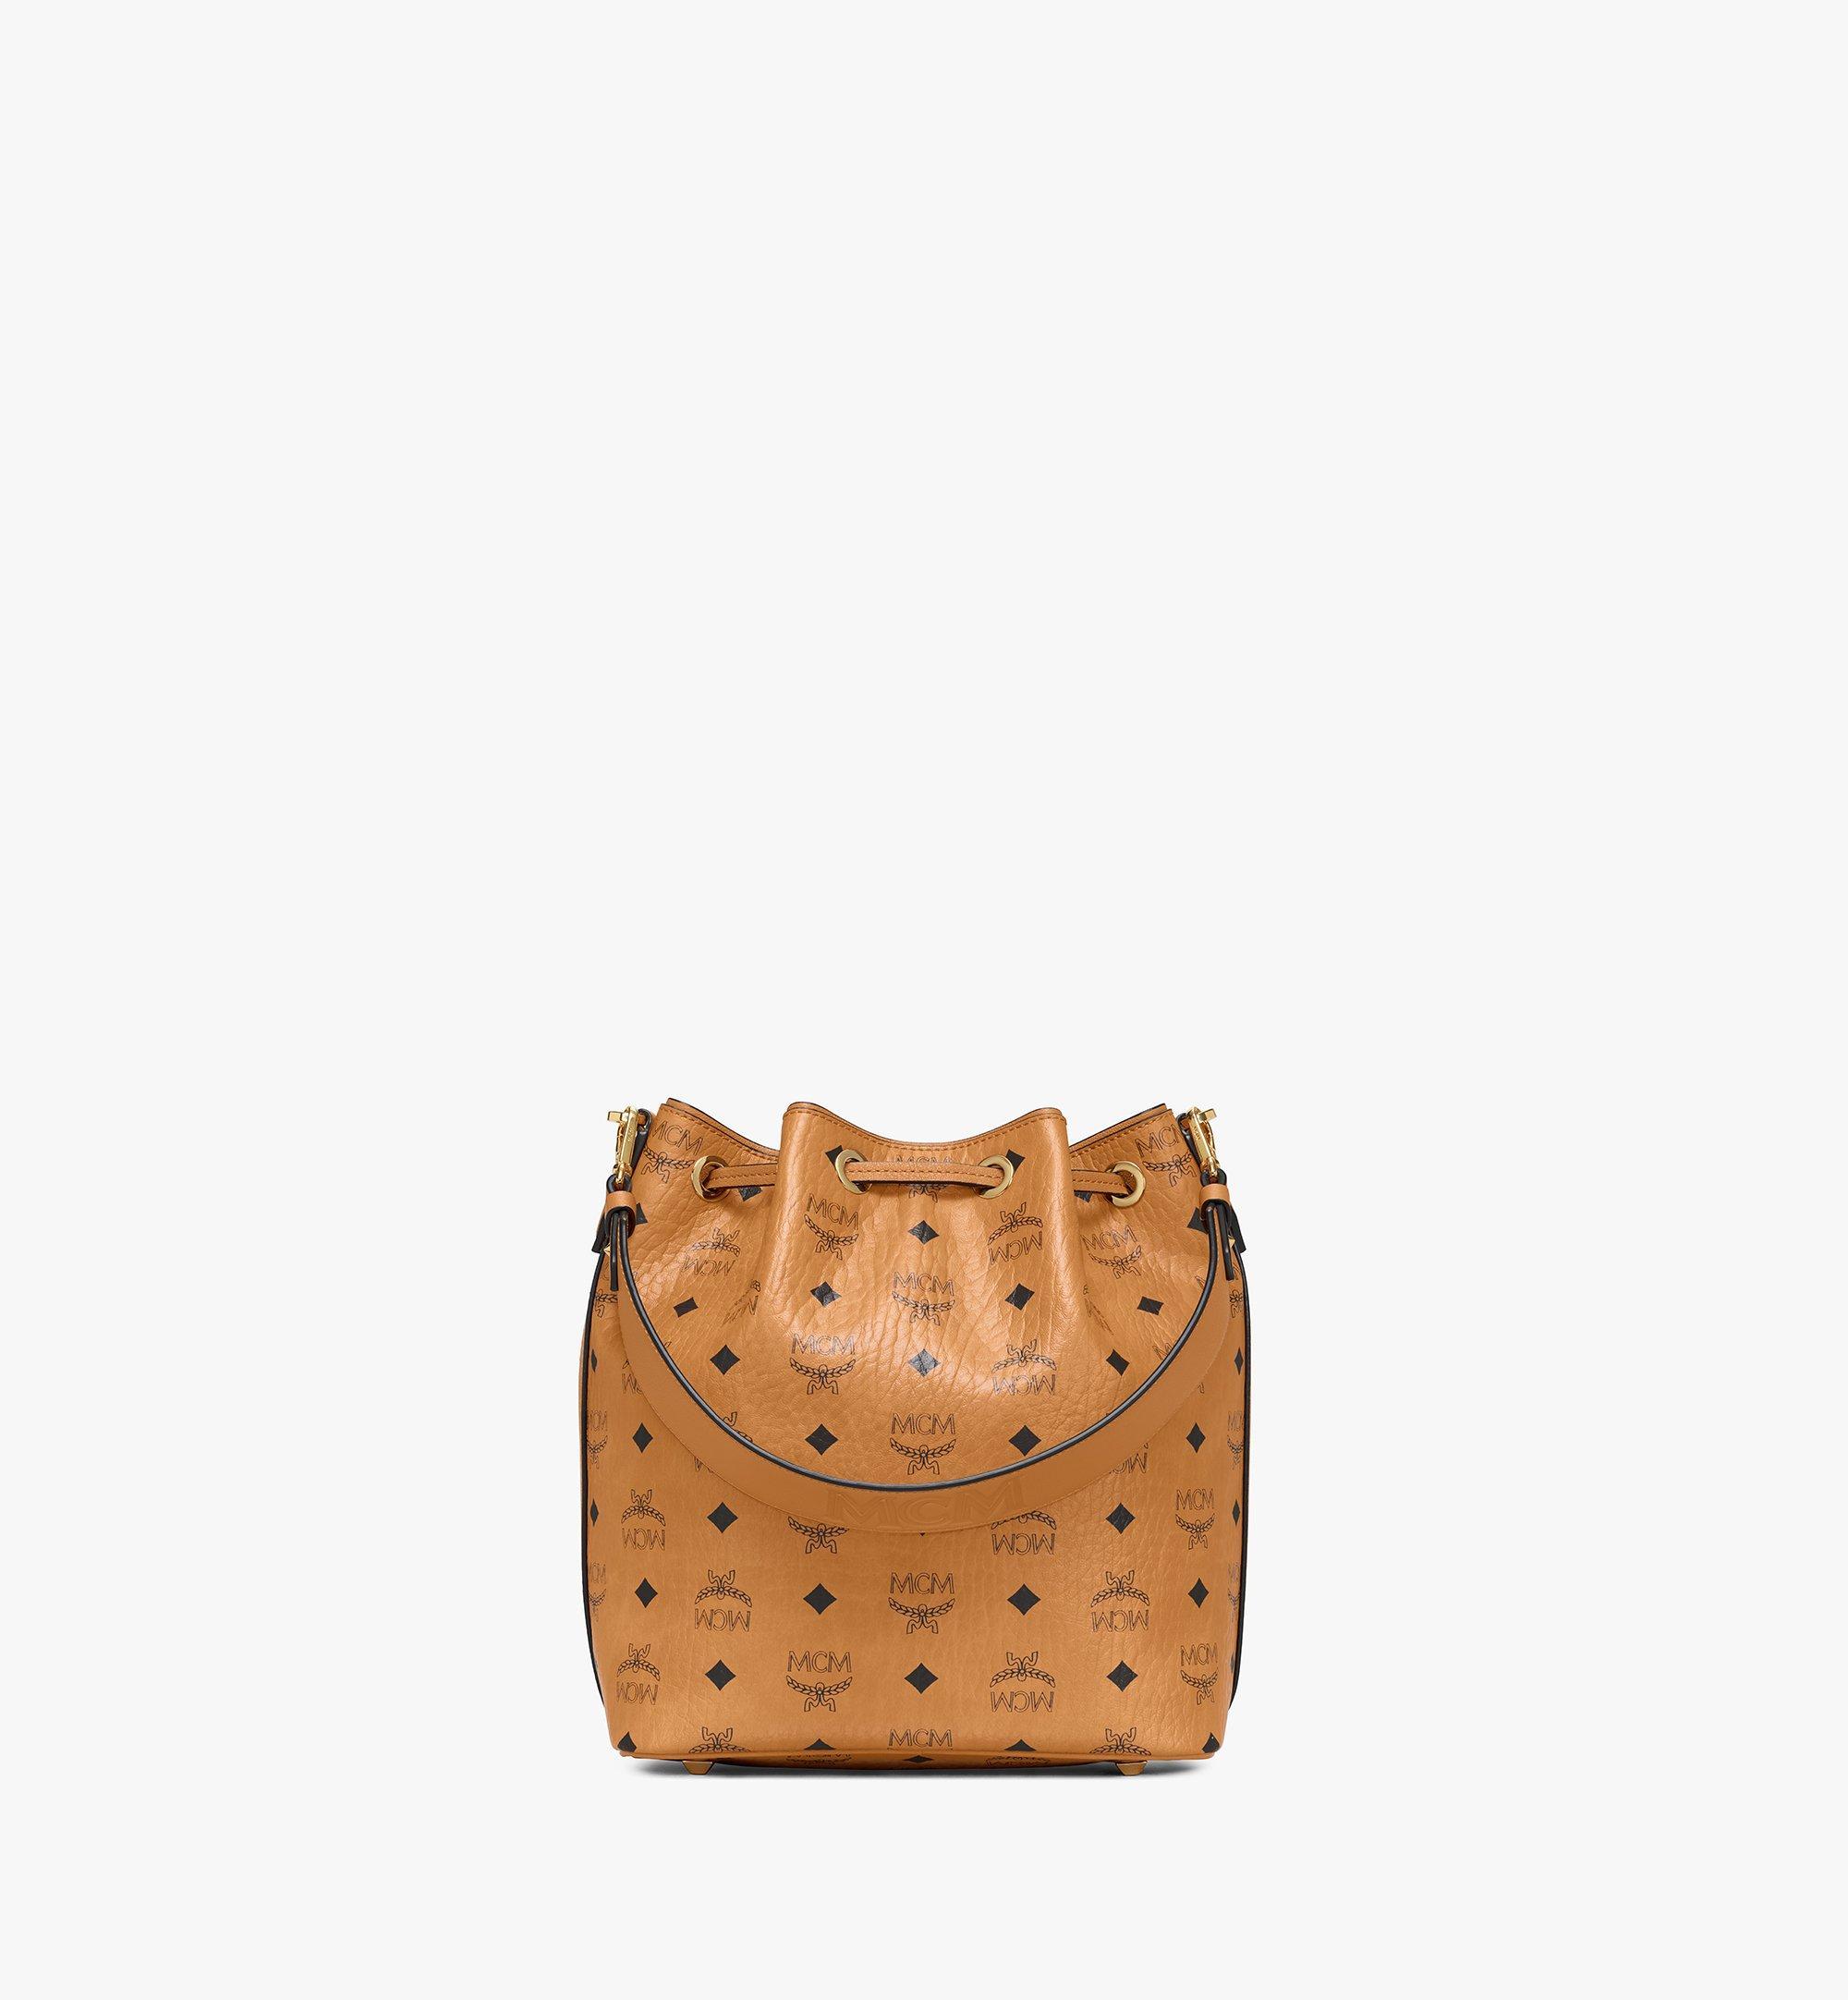 MCM Essential Drawstring Bag in Visetos Original Cognac MWDAASE02CO001 Alternate View 3